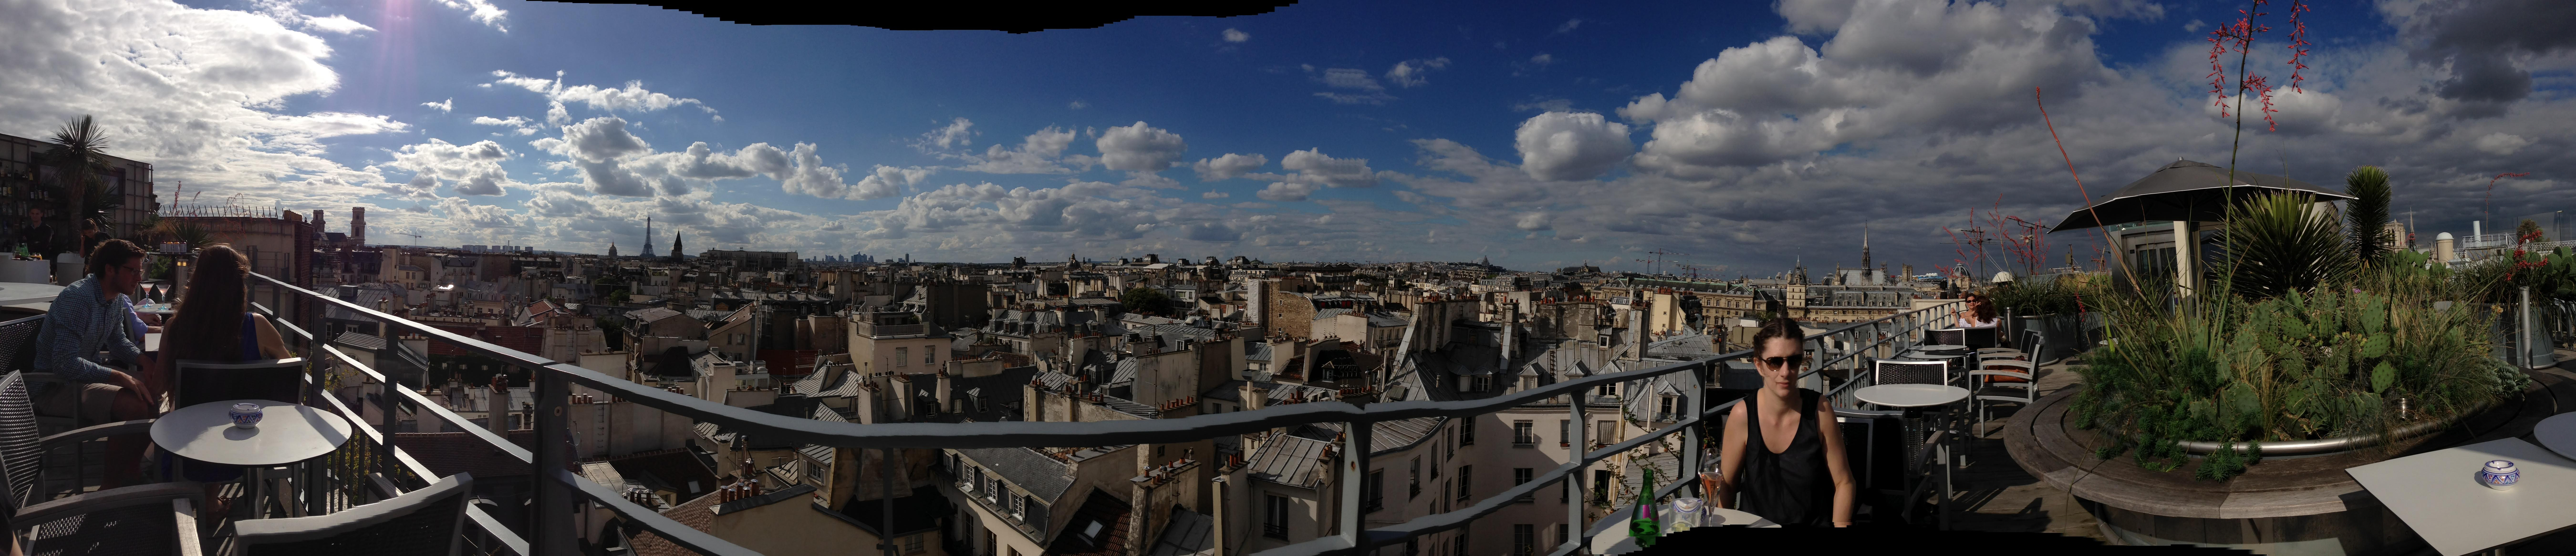 holliday Inn terrace in Paris